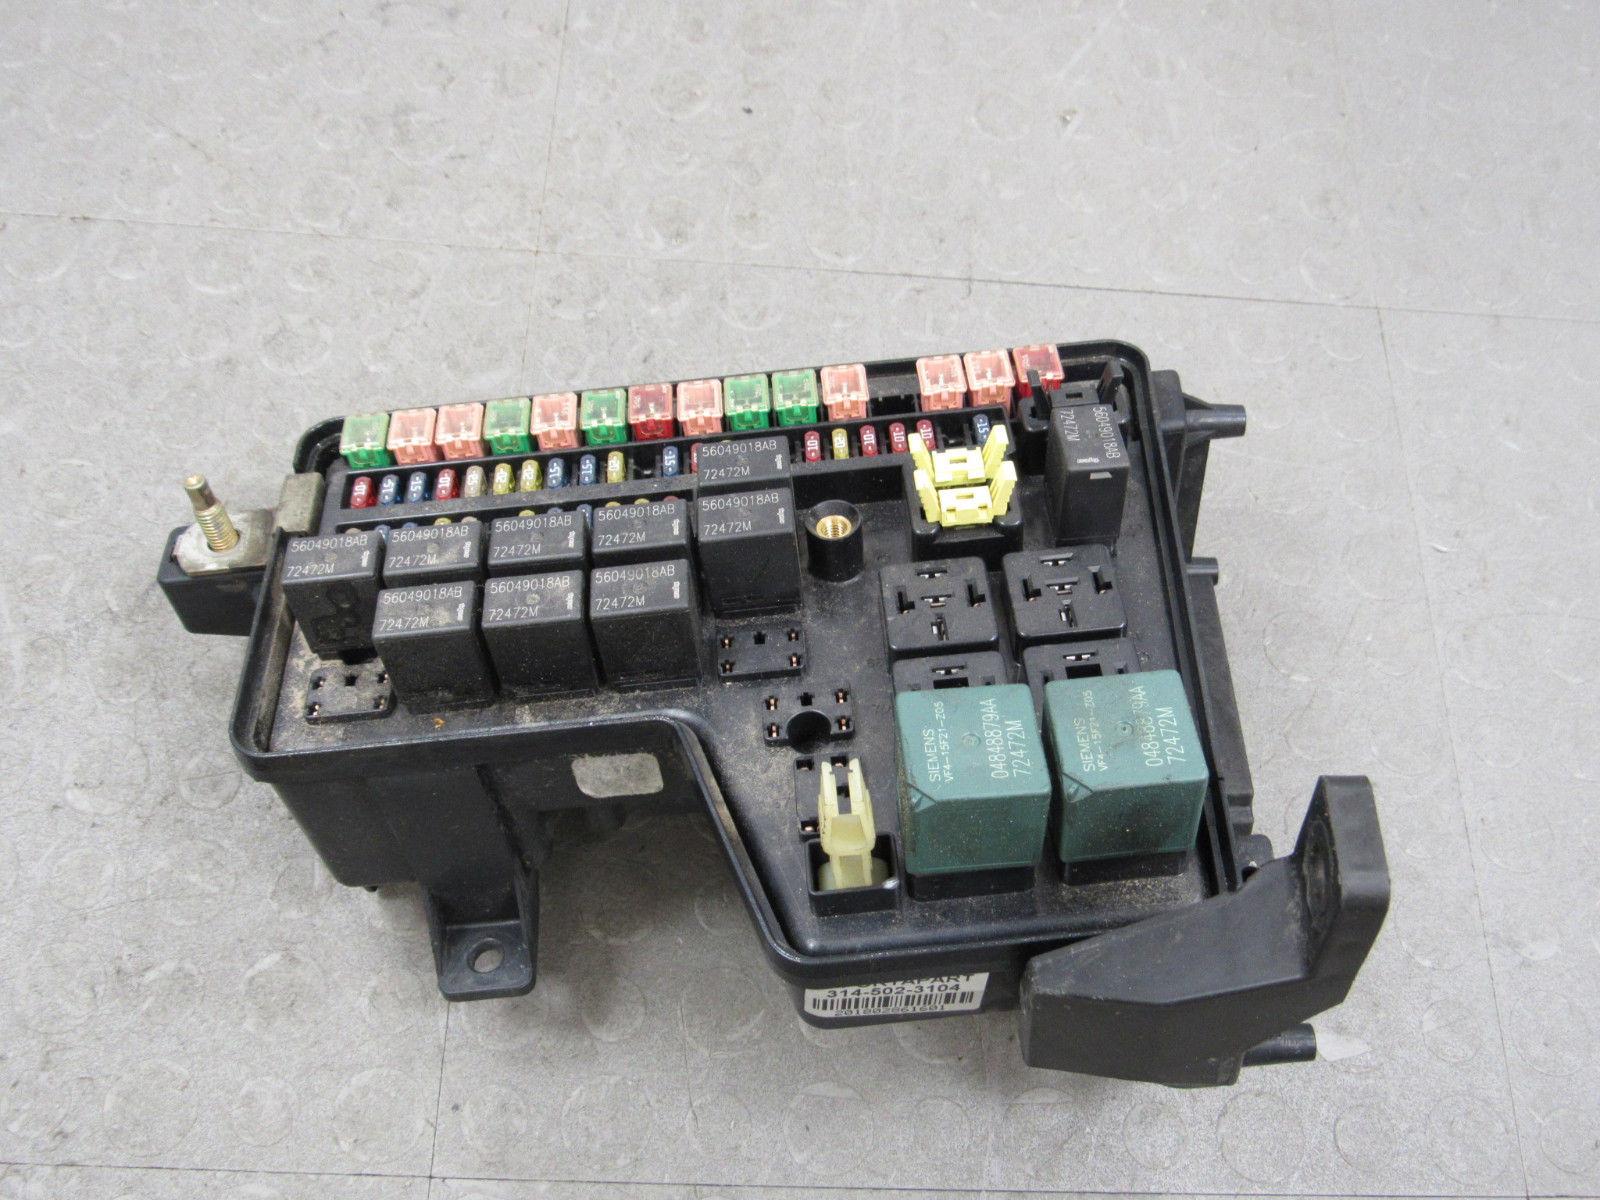 03 Dodge Ram Fuse Box Schematic Diagrams 02 Integrated Power Distribution Module 2006 1500 Diagram